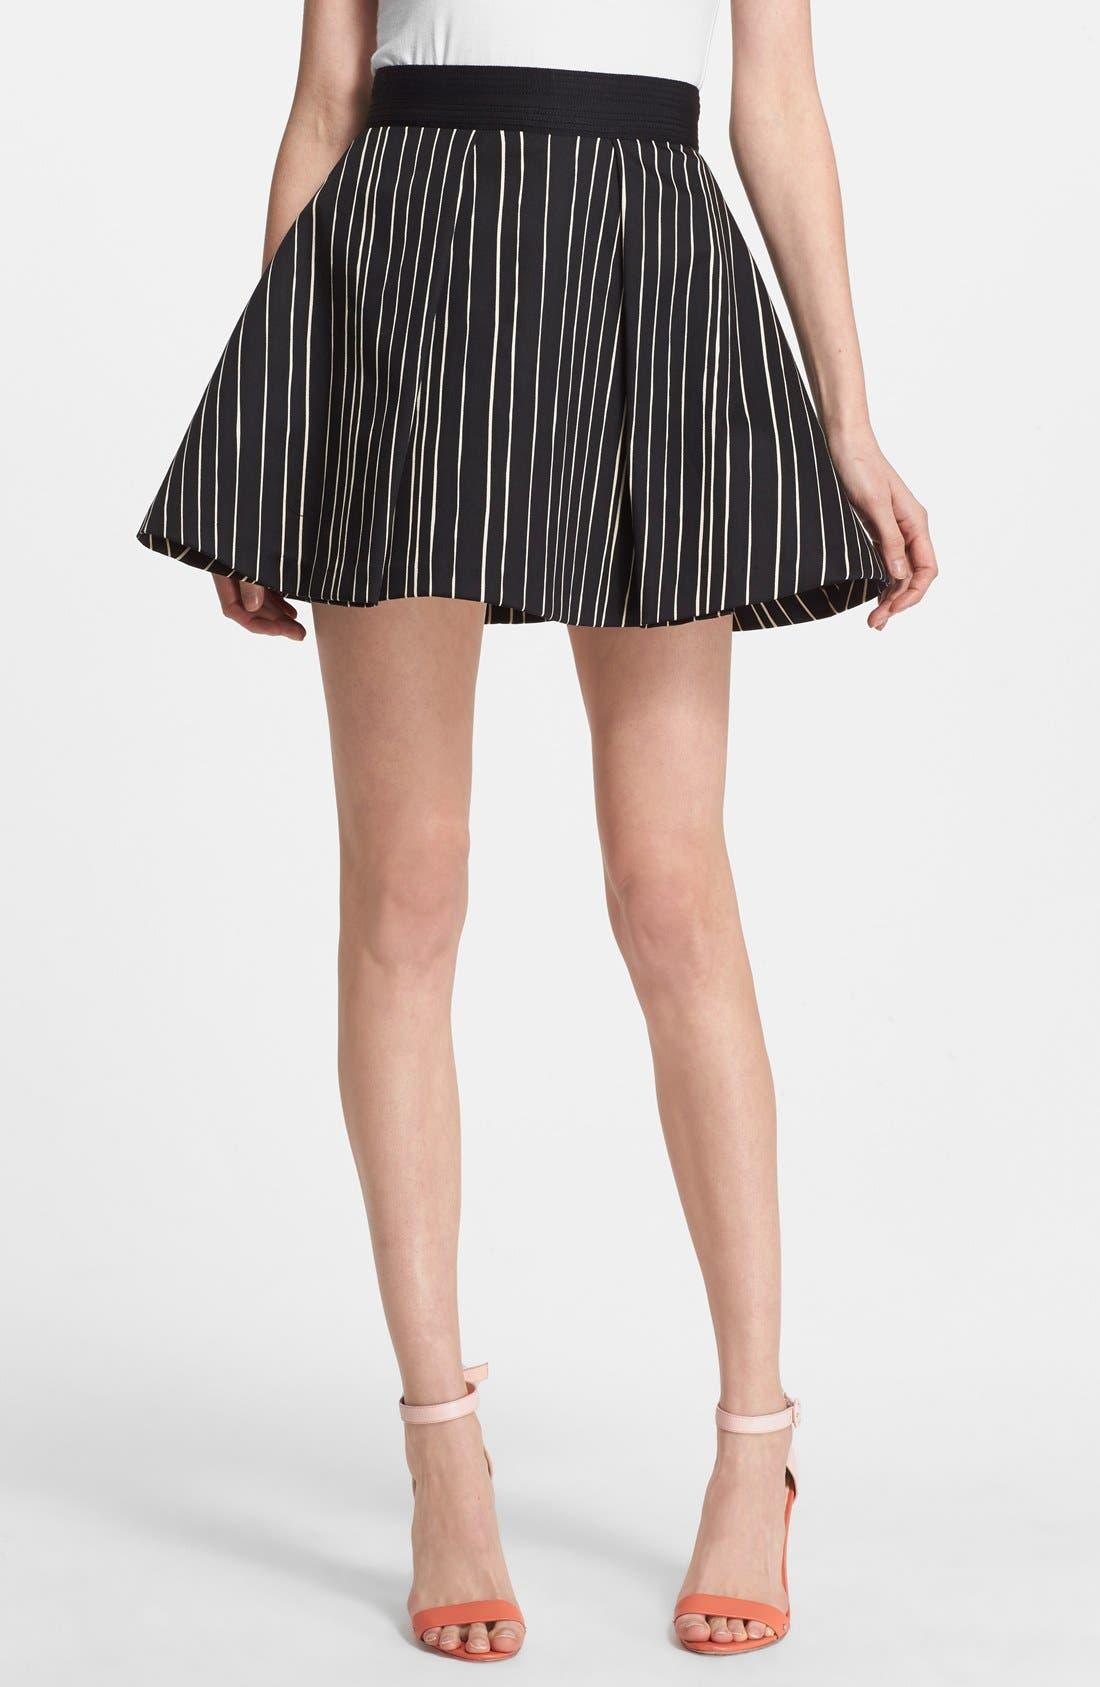 Alternate Image 1 Selected - Alice + Olivia 'Libby' Stripe Flared Skirt